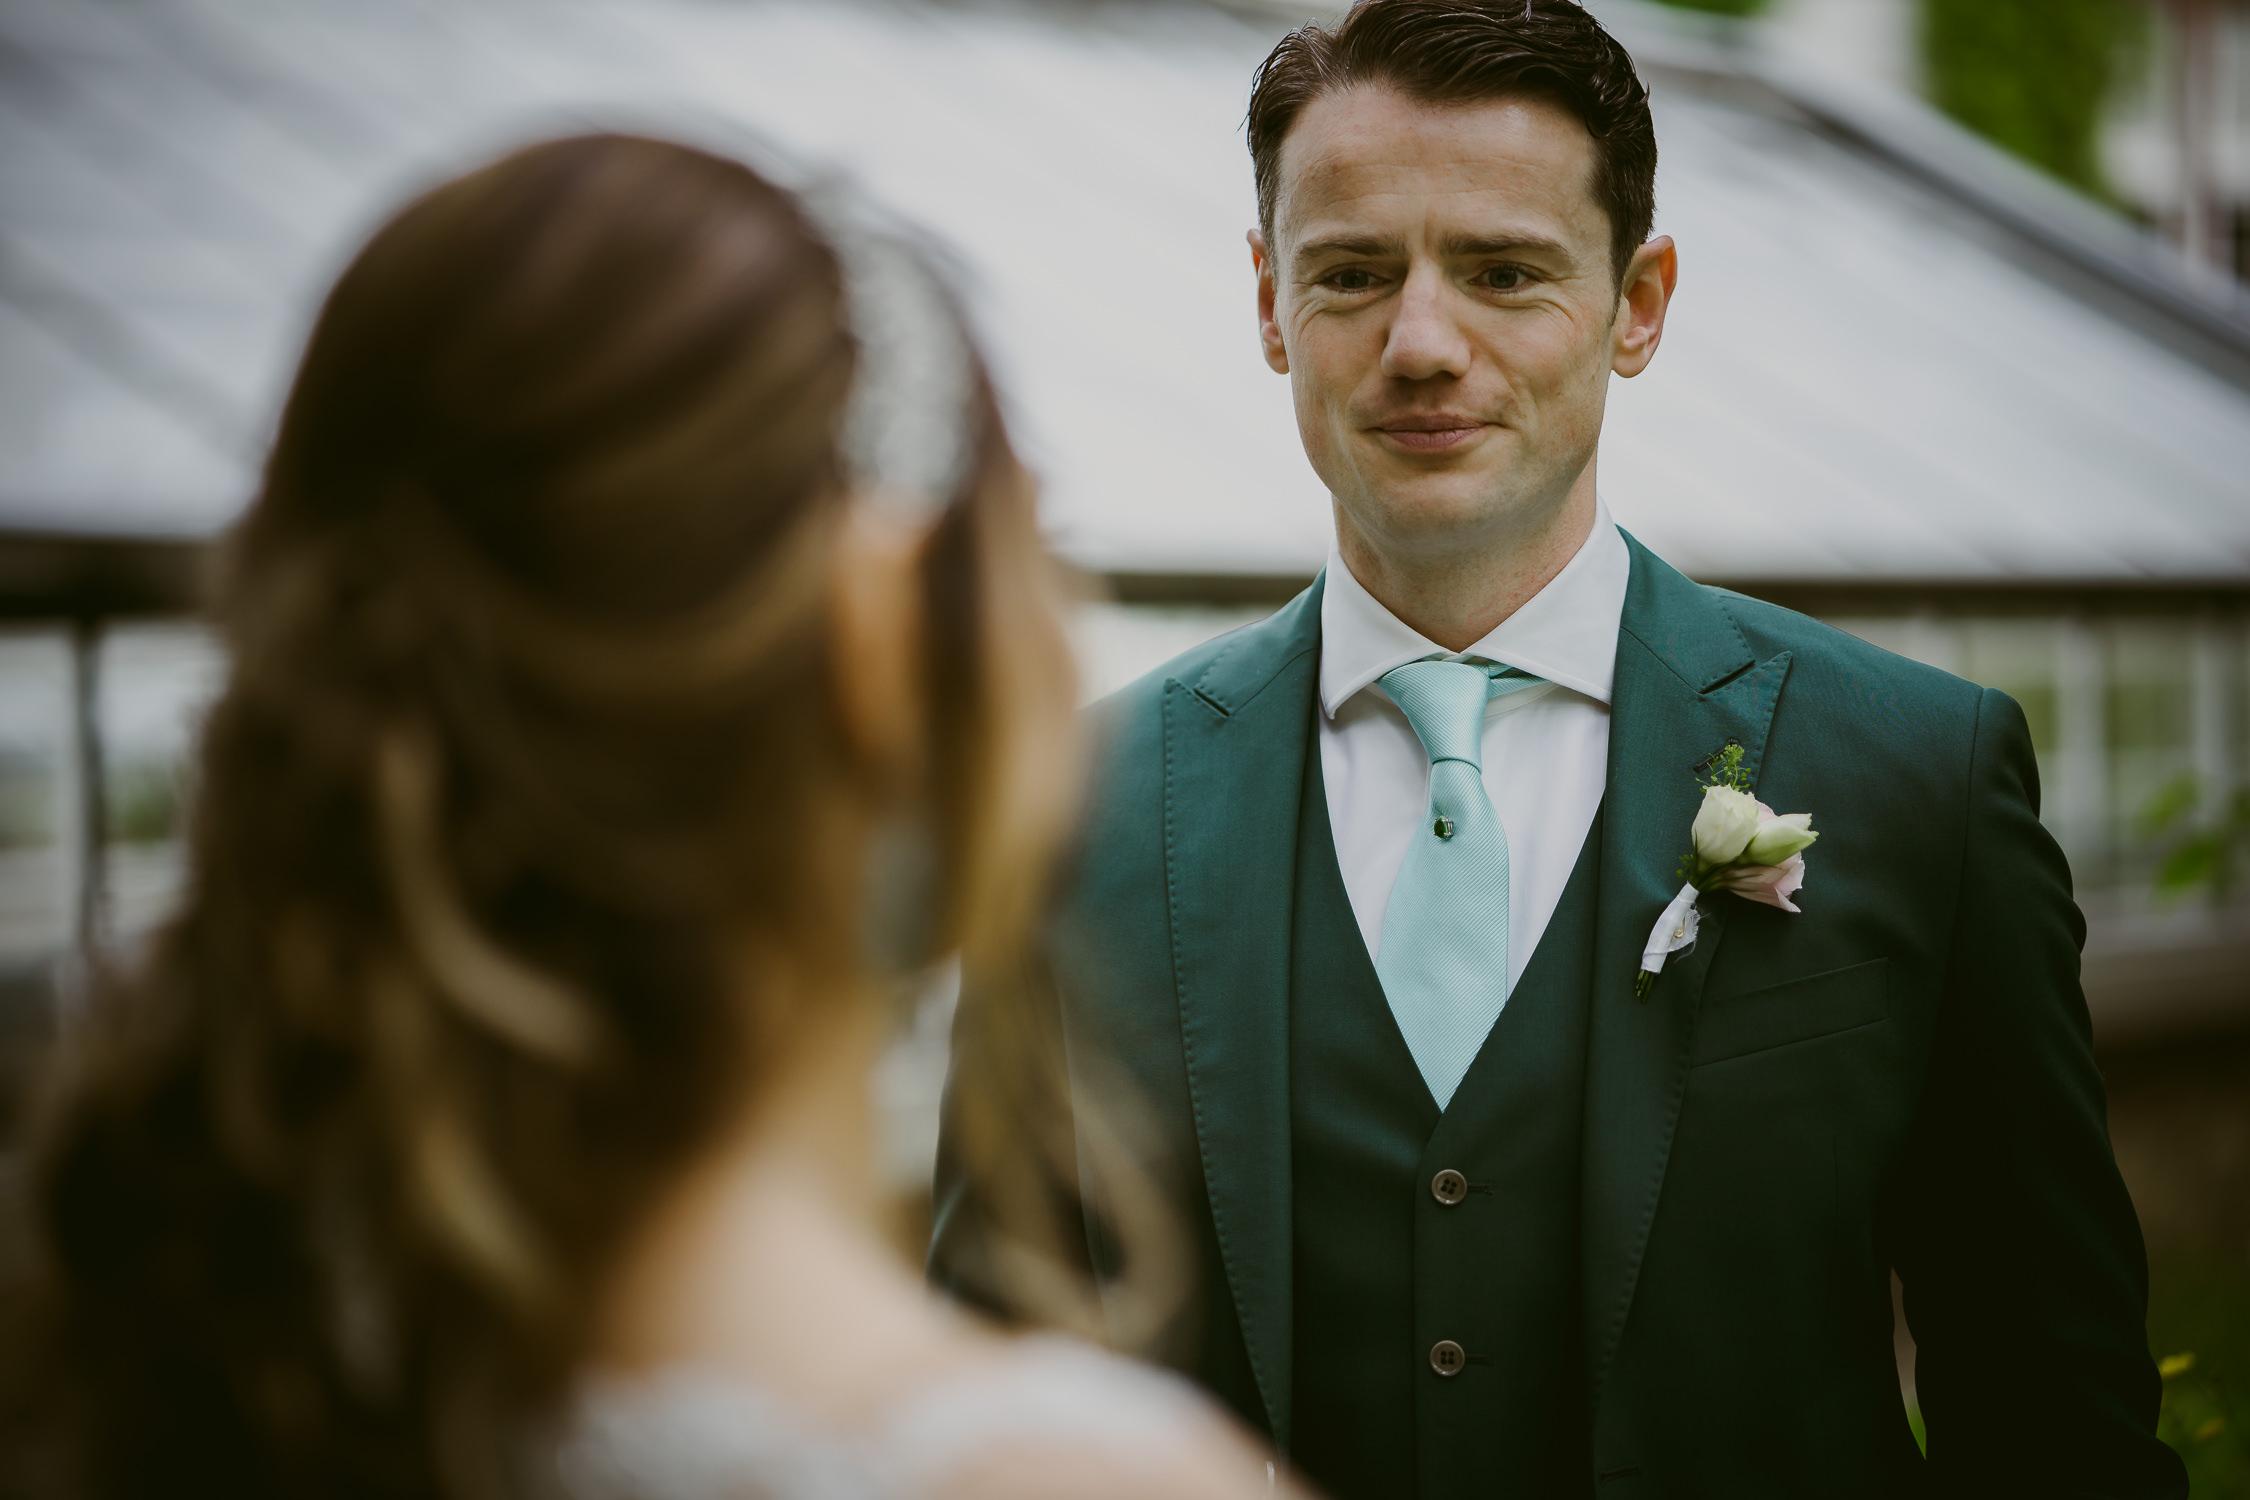 bruidsfotografie-amsterdam-utrecht-trouwfotograaf-mark-hadden-wedding-photography-Robin & Guus-045.jpg